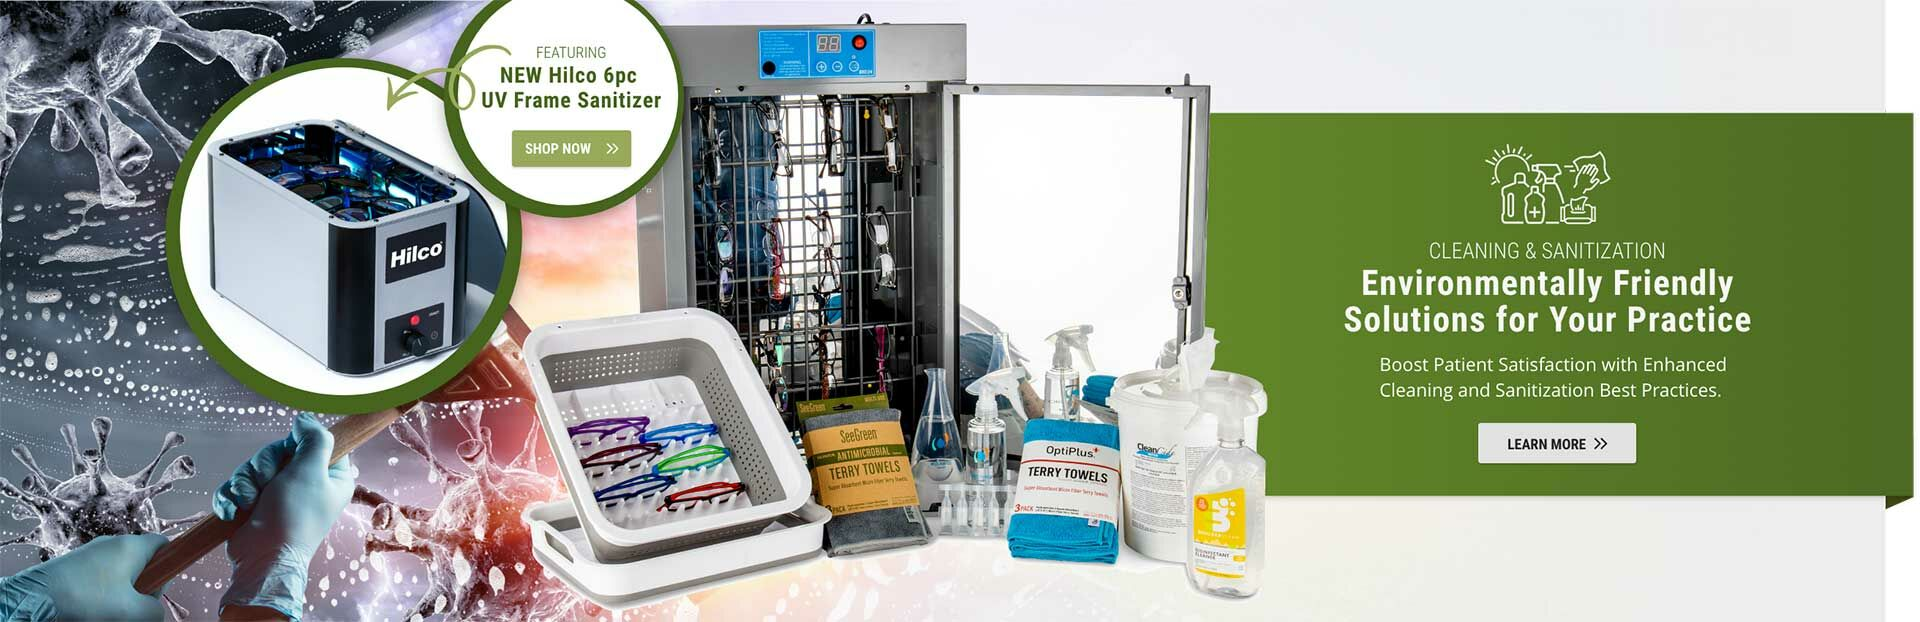 hilco-vision-sanitize-and-clean-home-banner-v3